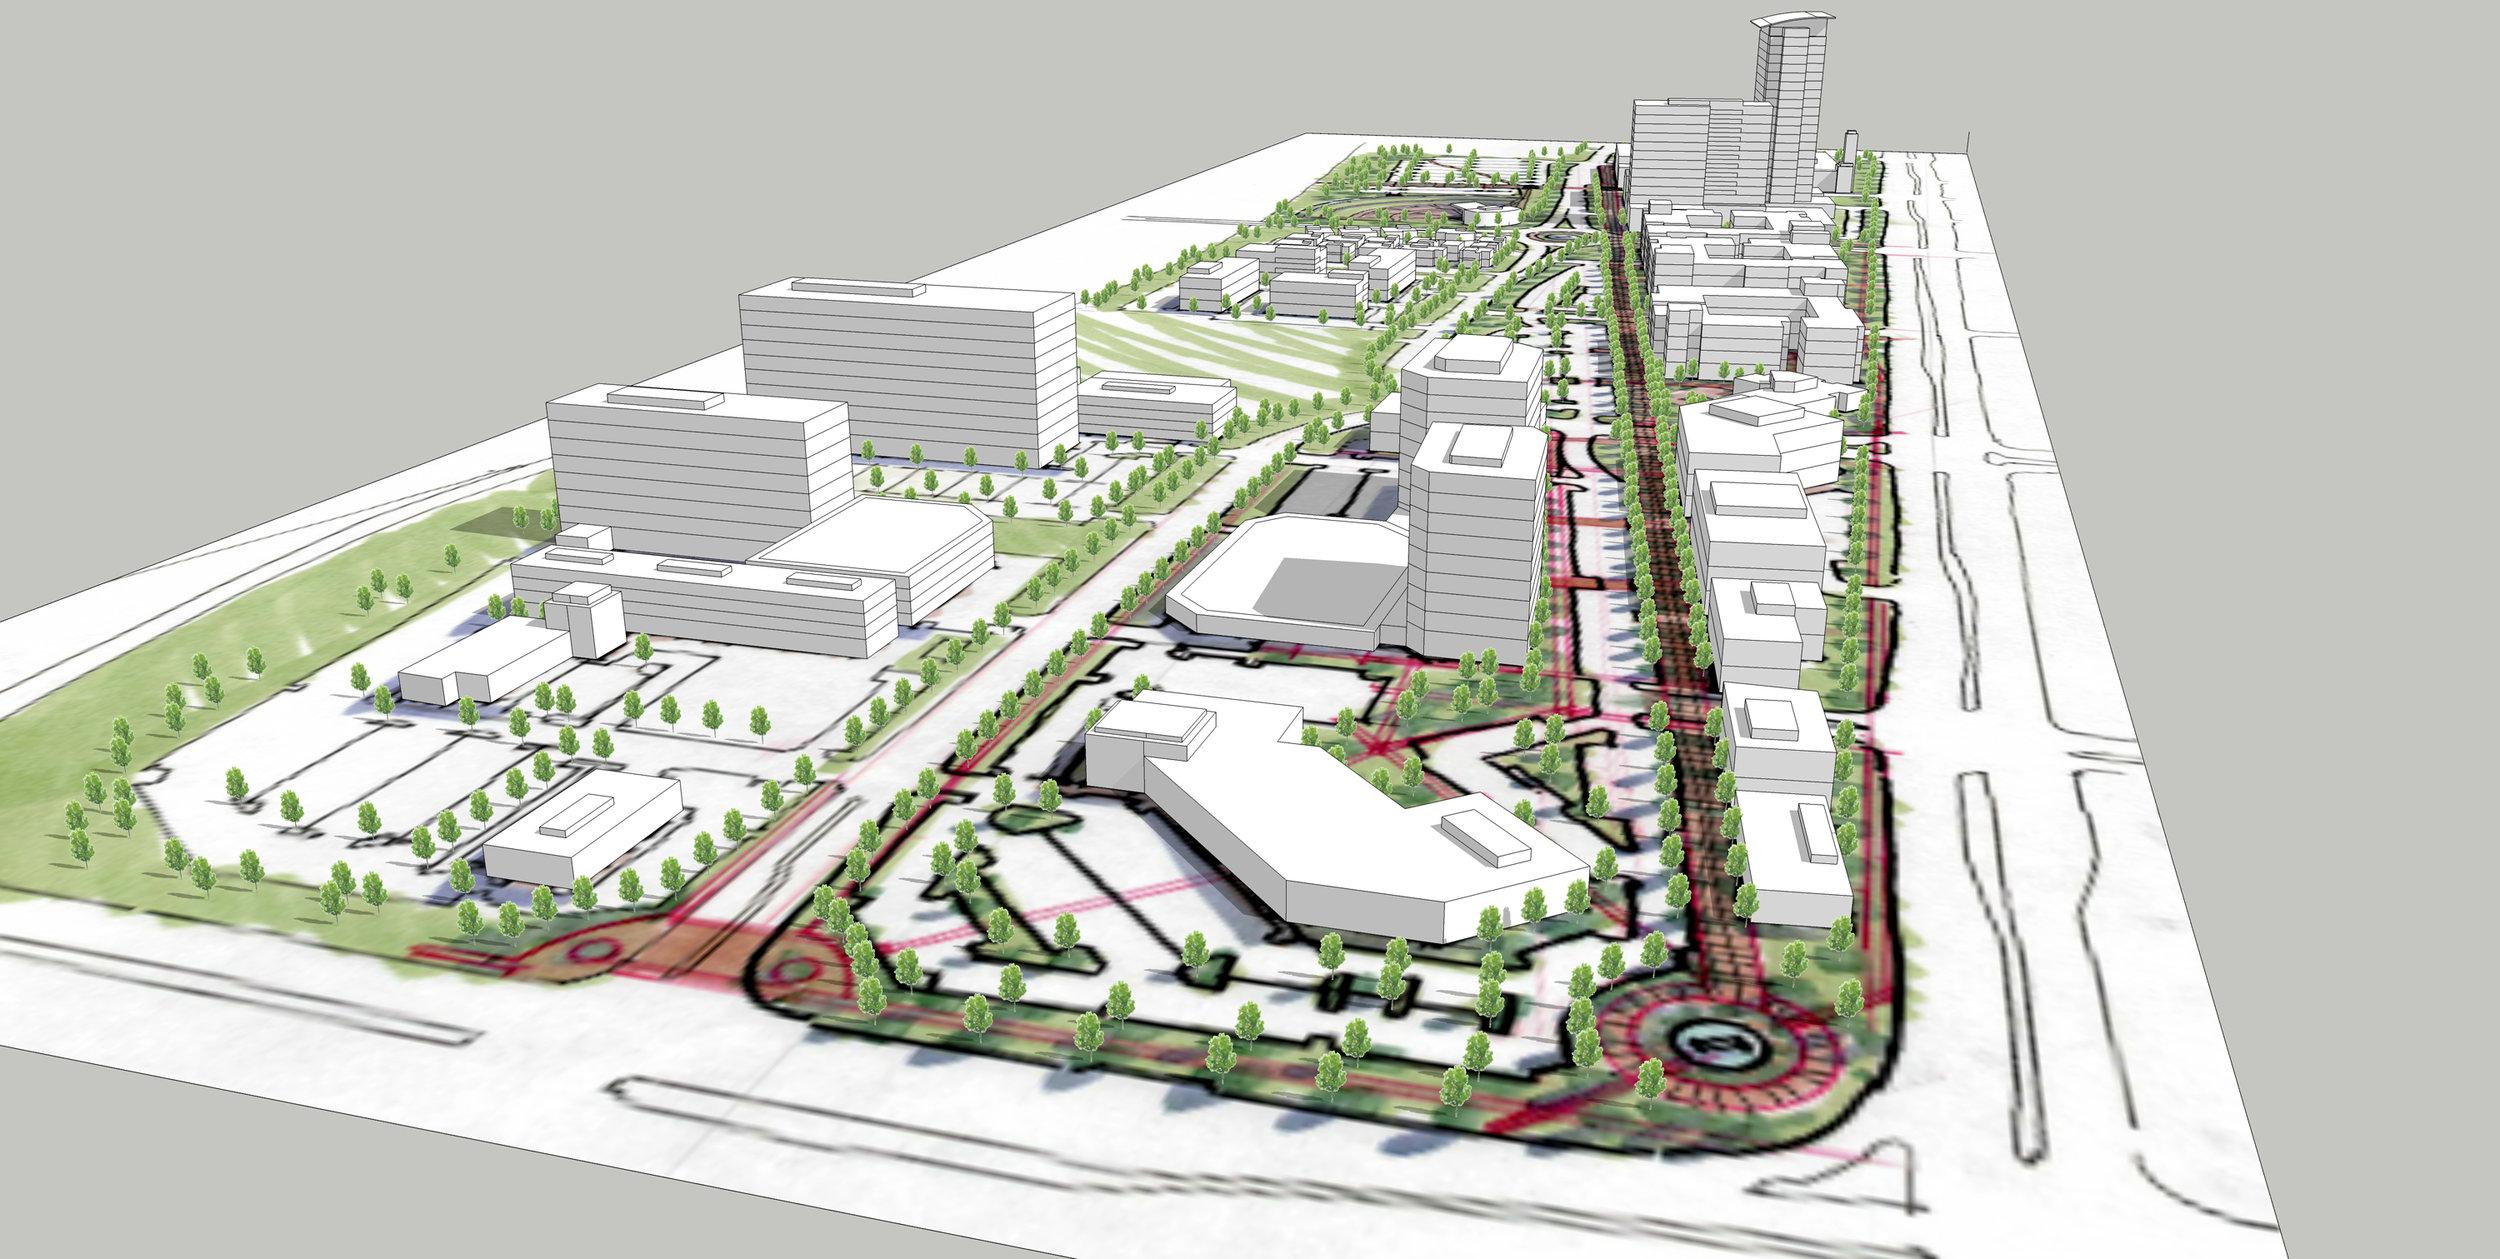 <f>Services</f><f>UrbanDesign</f><f>Markets</f><f>UrbanDesign+Planning</f><t>College & Metcalf Entertainment Development</t><m>Overland Park, KS</m>